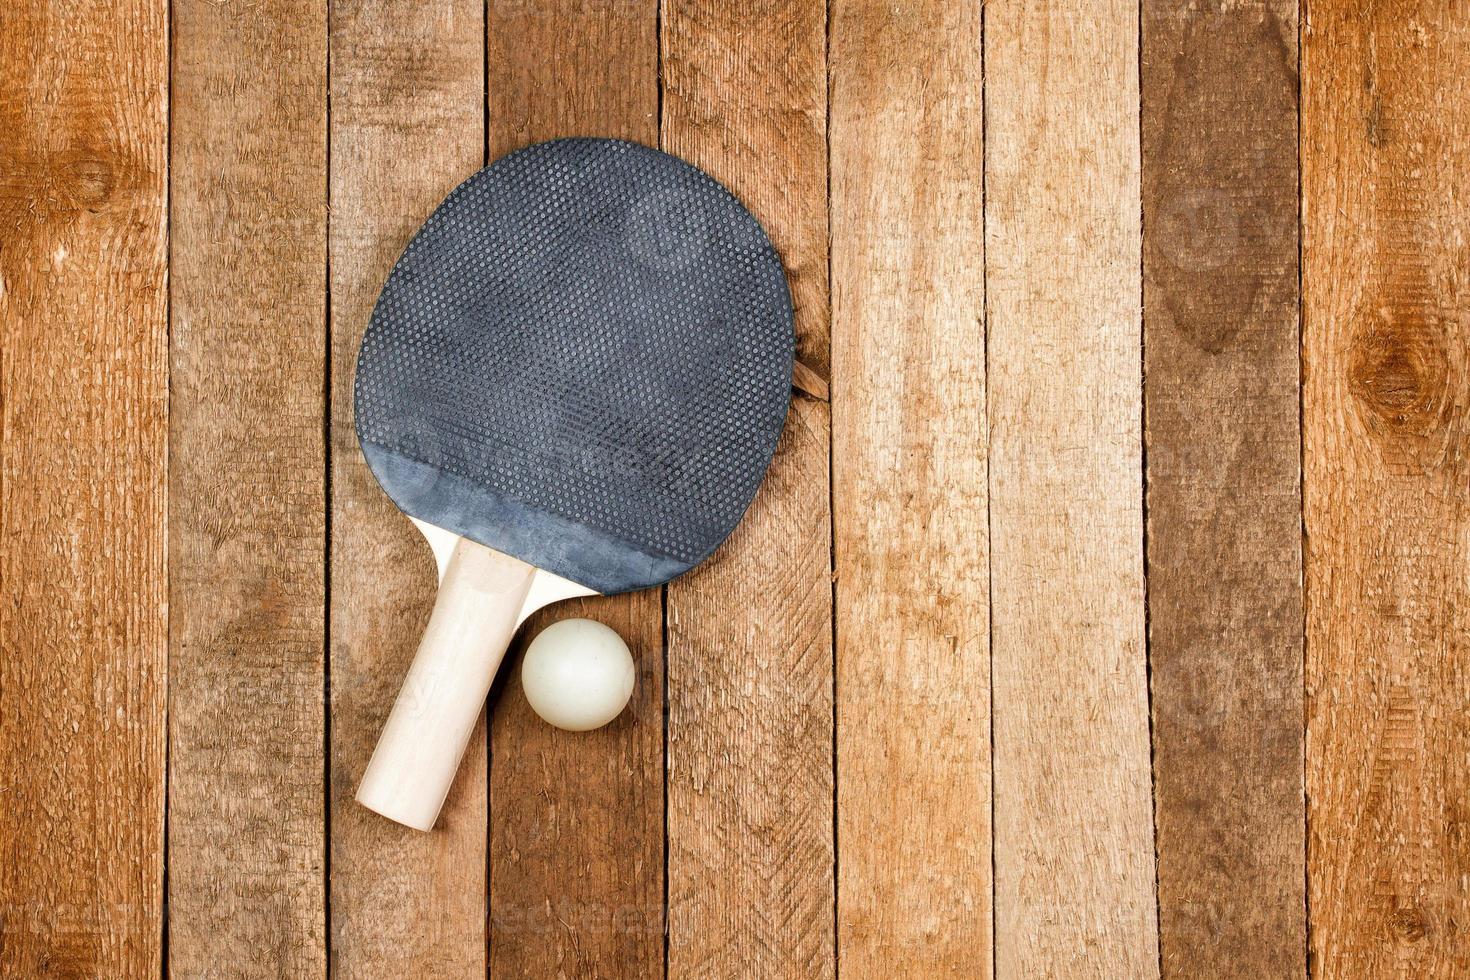 pagaie de ping pong vintage photo